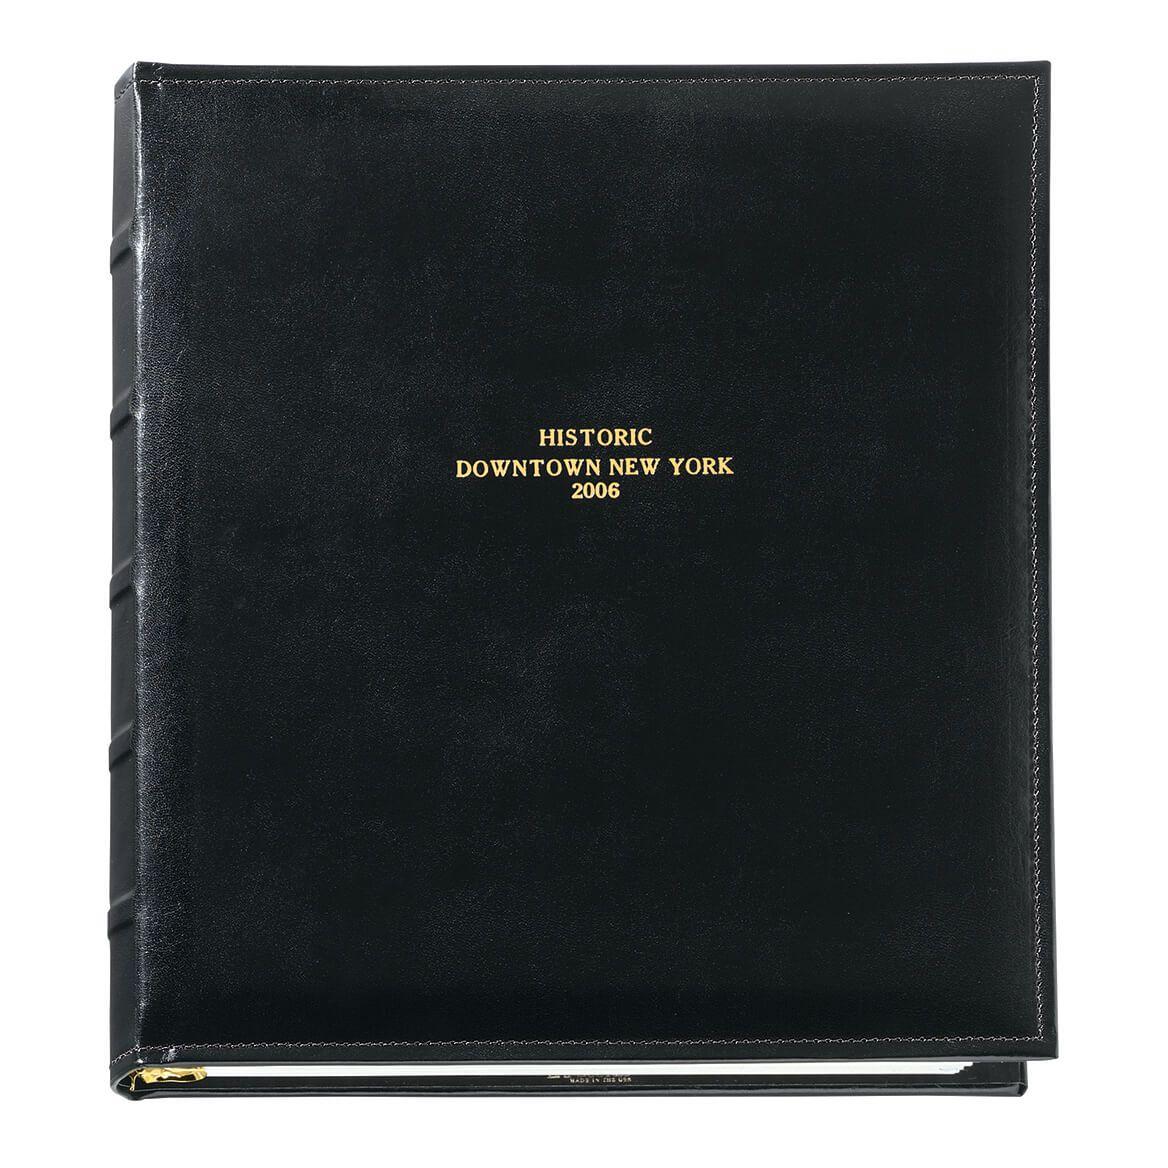 Personalized Charter Oversized Extra-Capacity Album-332339